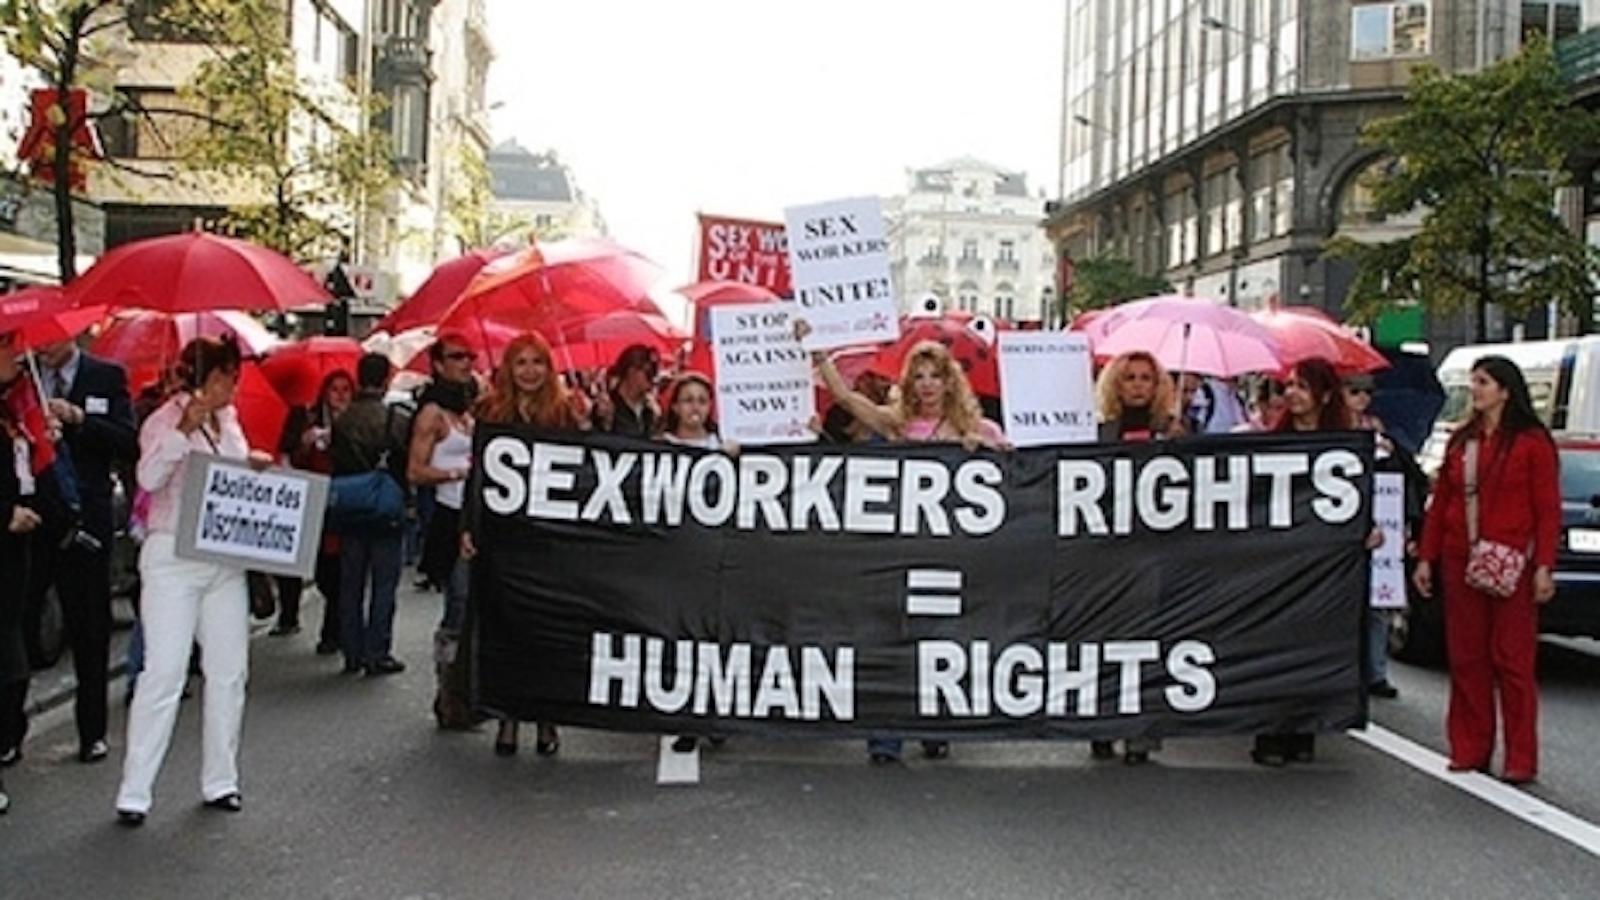 Amnesty_international_decriminalize_sex_work_galore_mag_1-df096c286cb8d99c2ba58db59557bb3b-